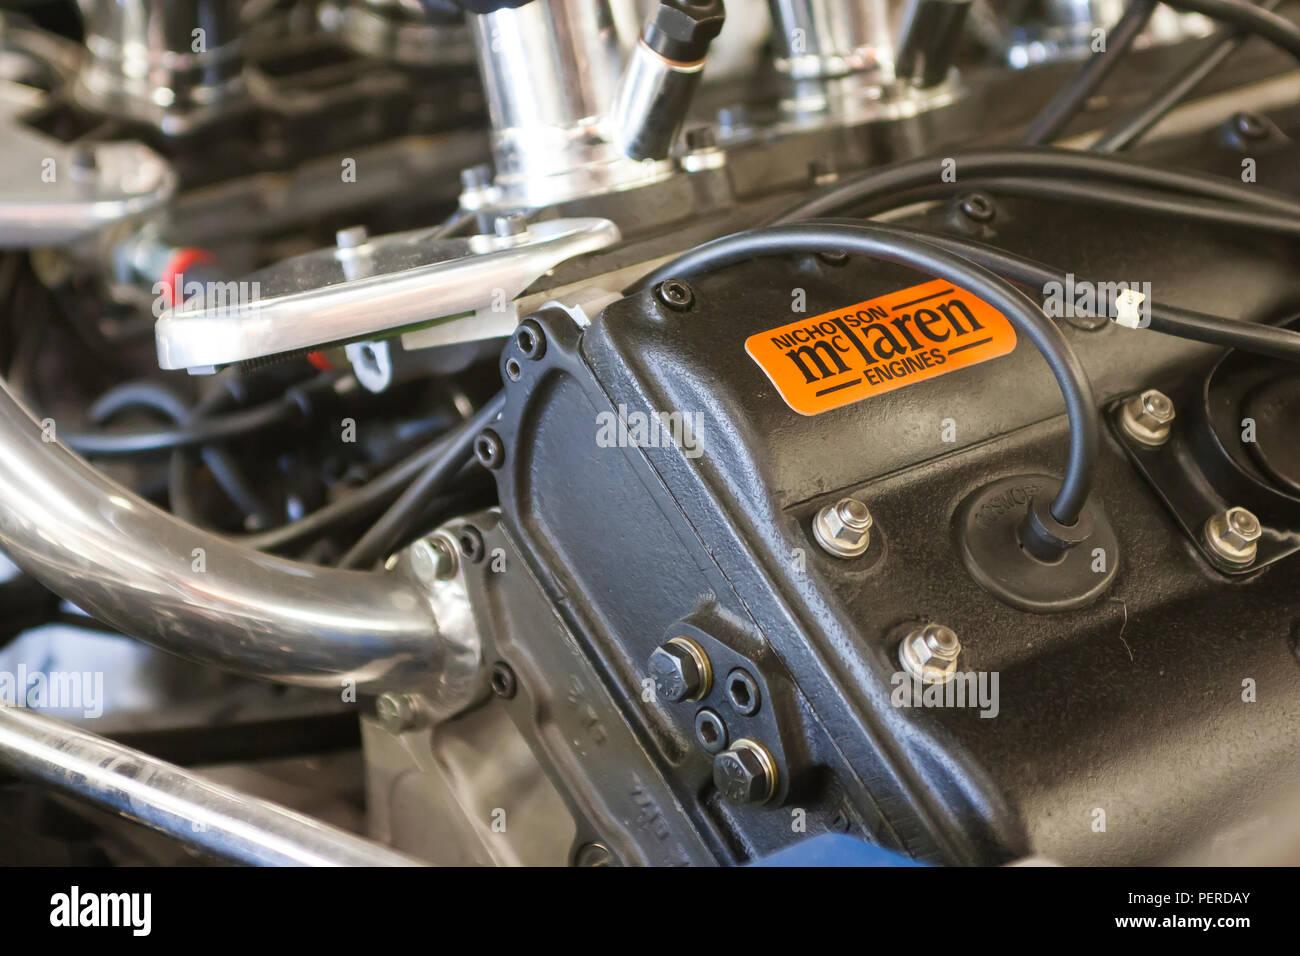 Cosworth Engine Stock Photos & Cosworth Engine Stock Images